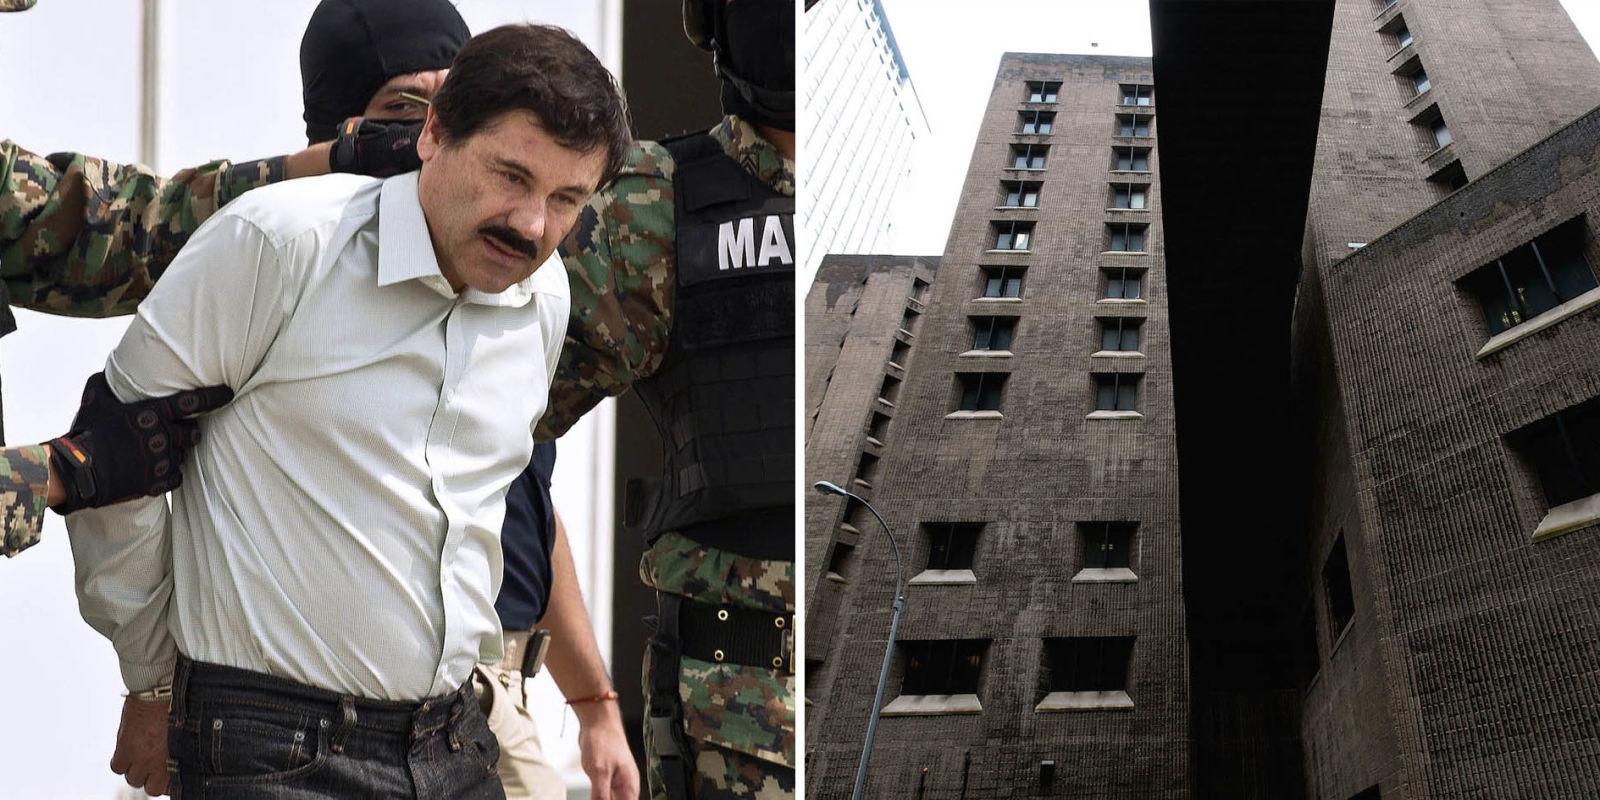 el chapo u0026 39 s new york jail is  u0026 39 worse than guantanamo u0026 39